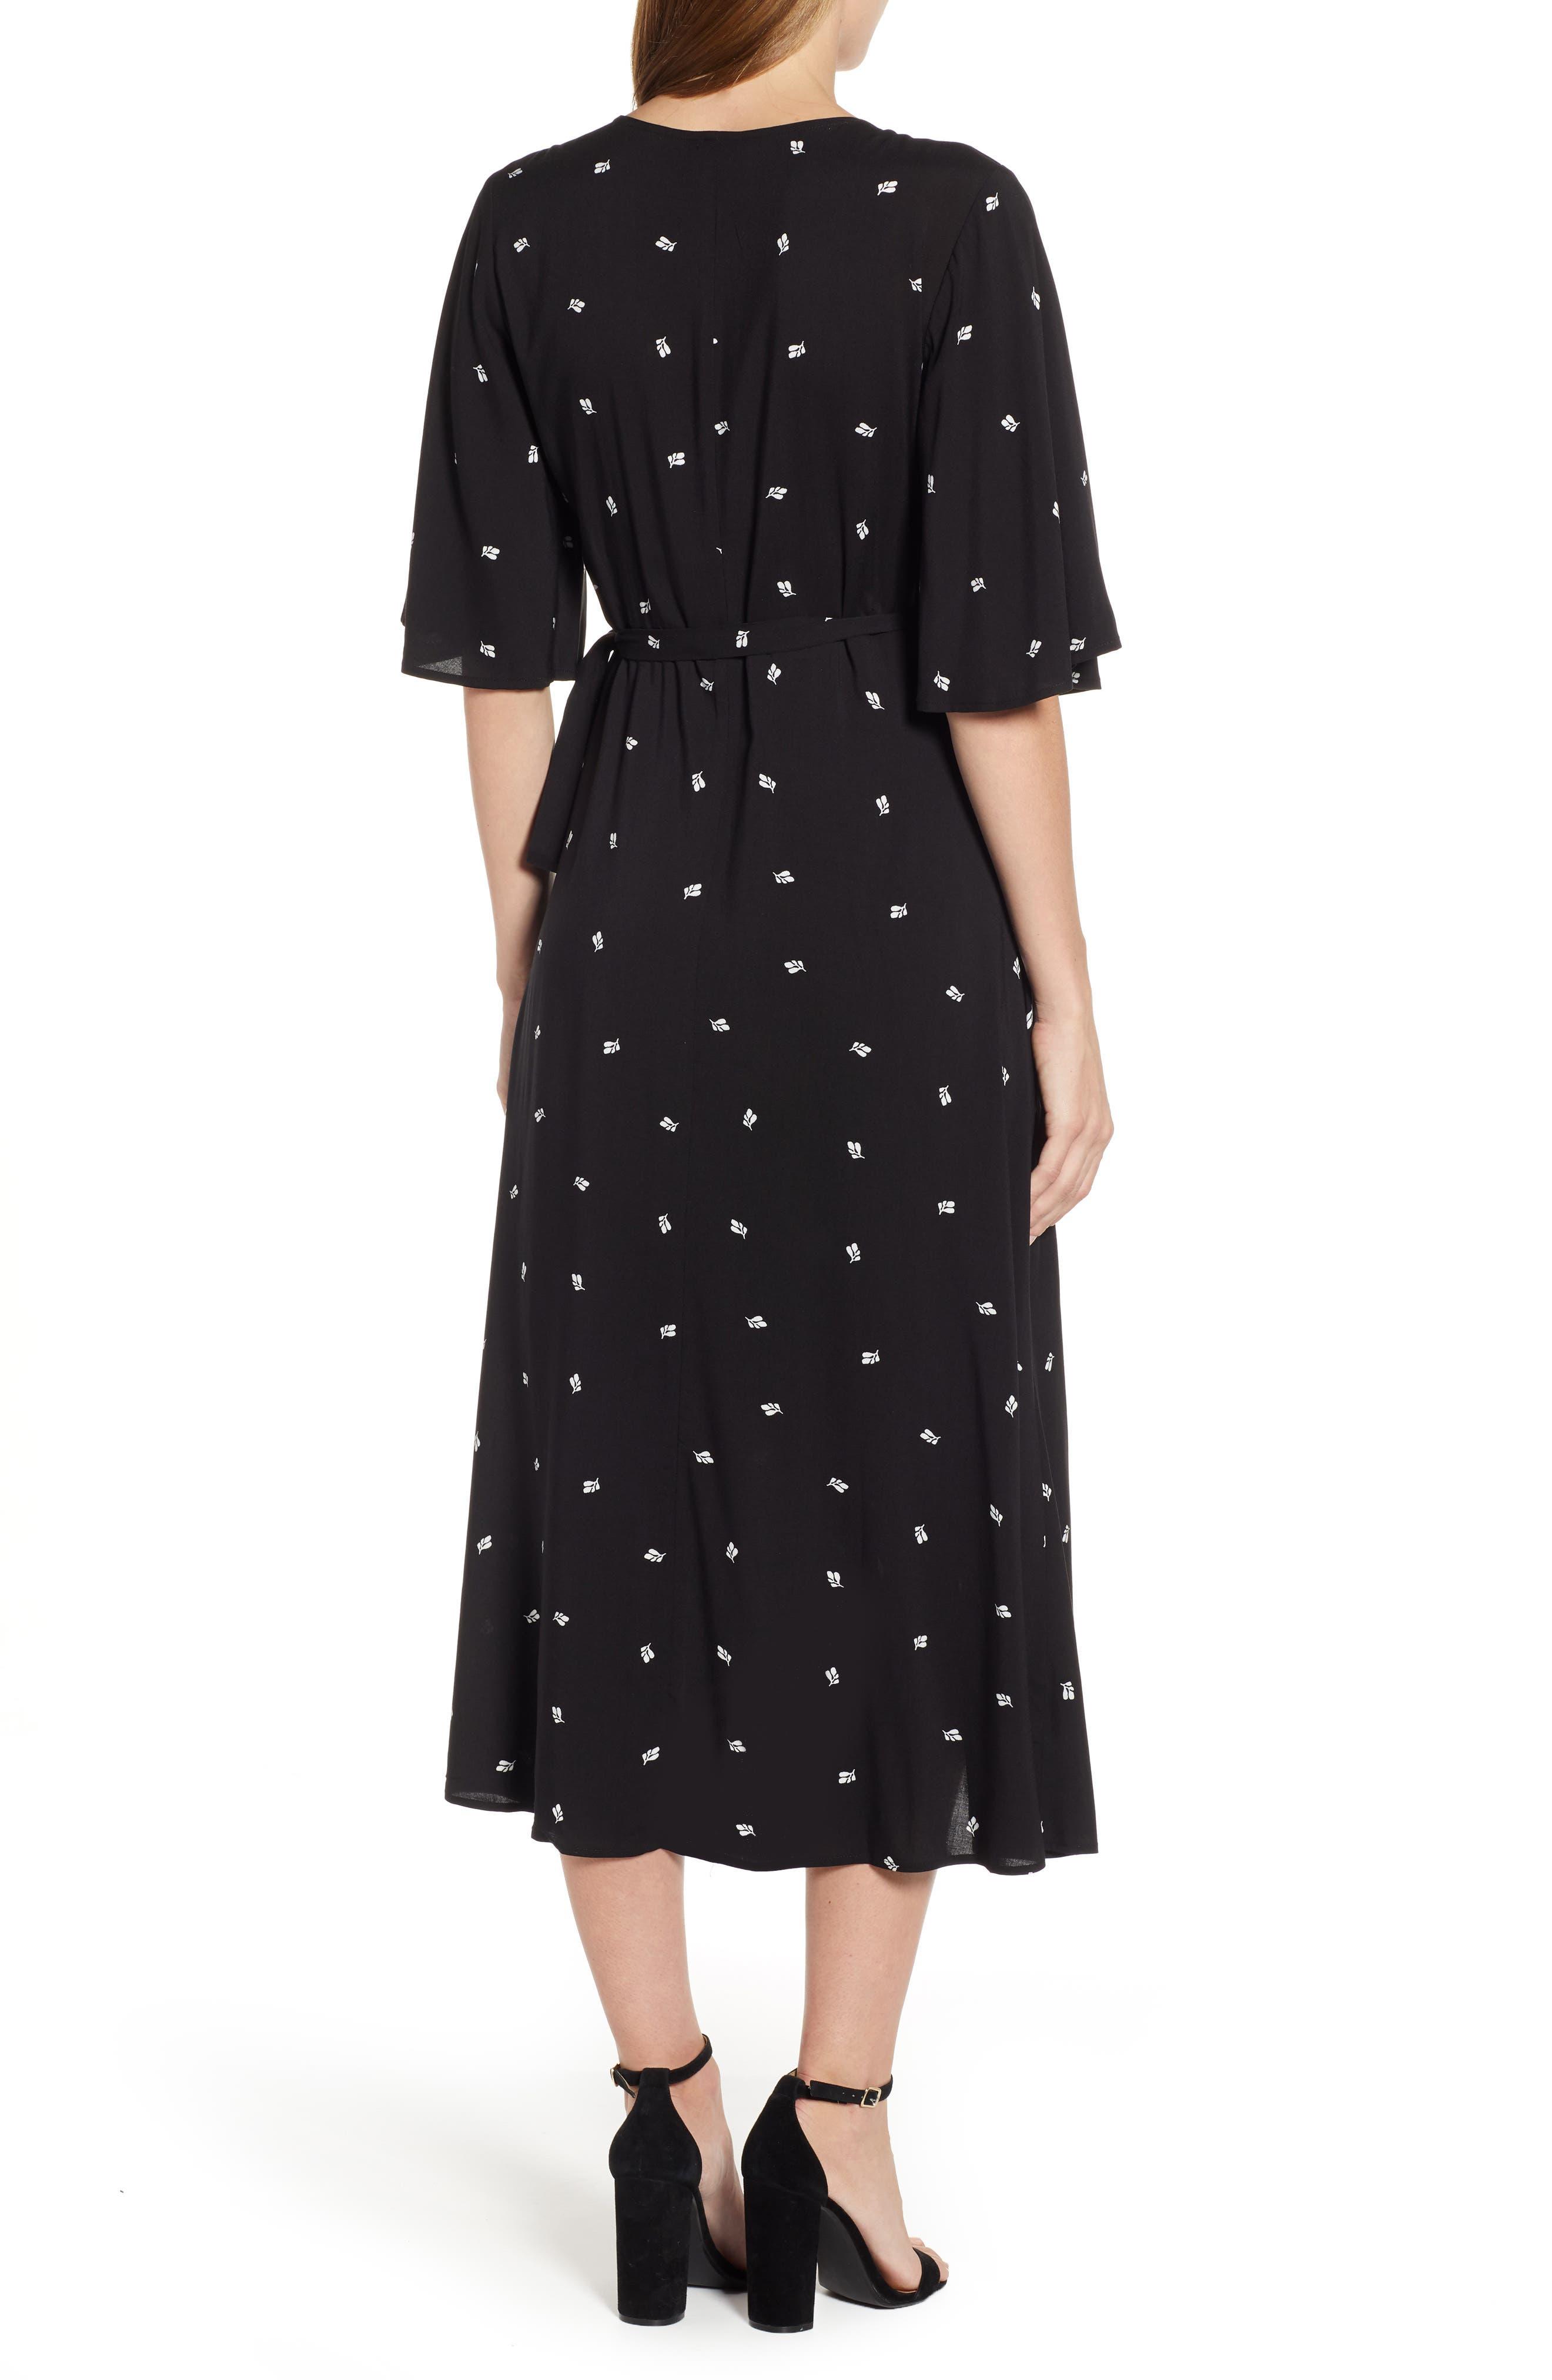 BOBEAU, Orna High/Low Wrap Dress, Alternate thumbnail 2, color, BLACK LEAF PRINT